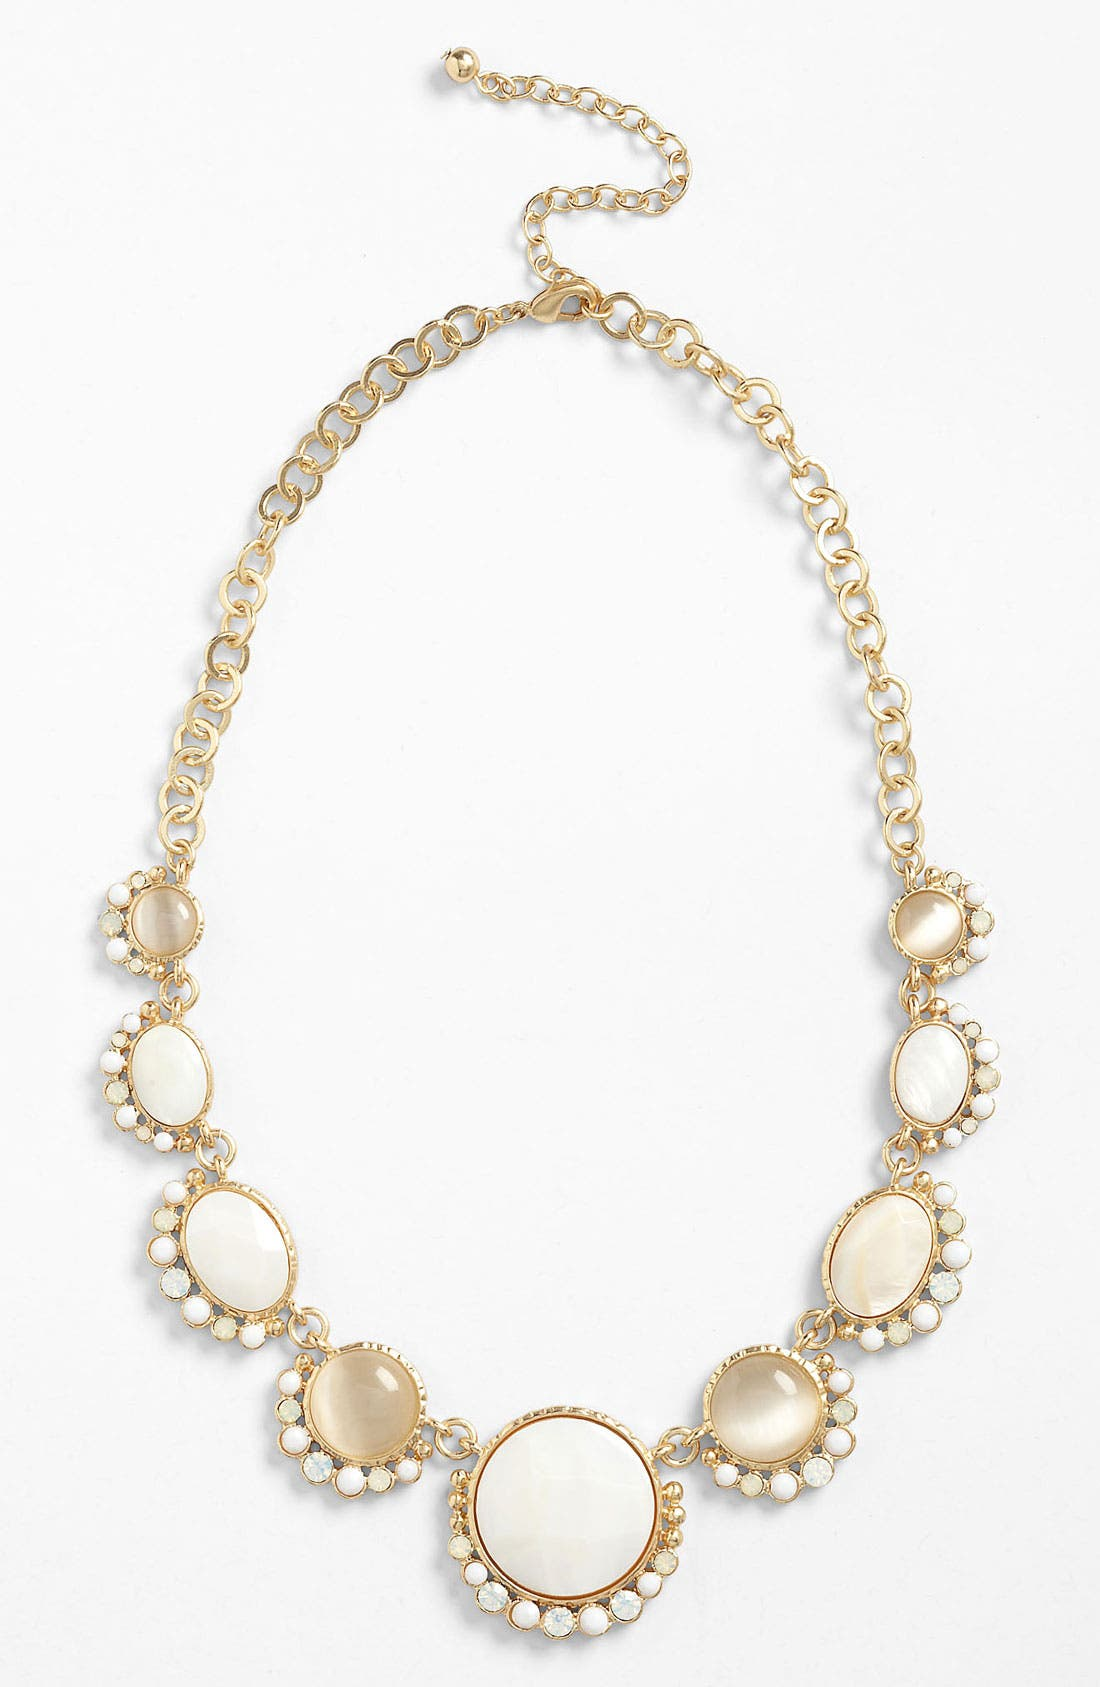 Alternate Image 1 Selected - Nordstrom 'Santorini' Collar Necklace